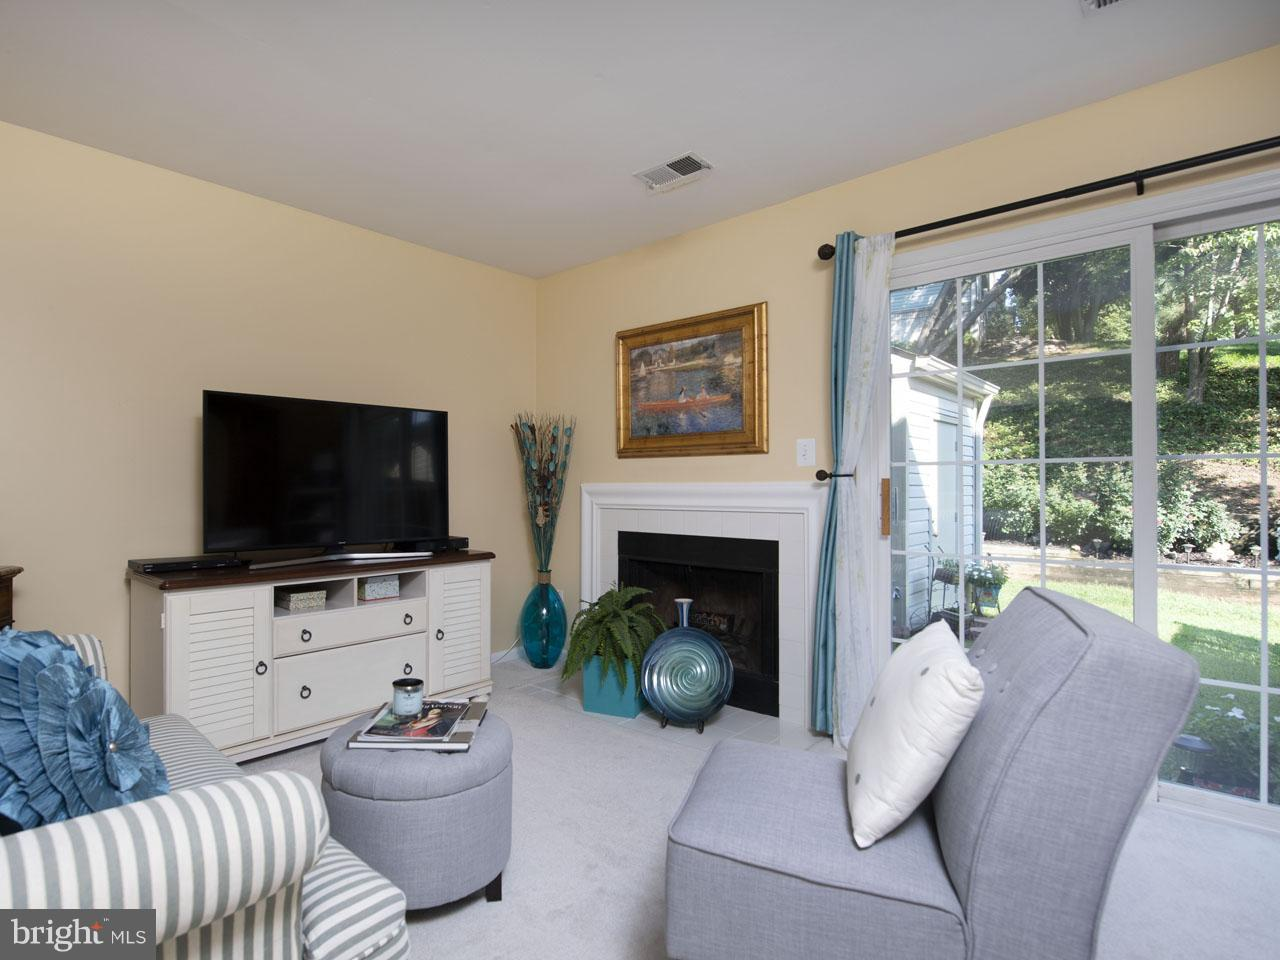 1002640508-300537941326-2021-07-22-05-00-38     Pinecrest   Alexandria Delaware Real Estate For Sale   MLS# 1002640508  - Best of Northern Virginia